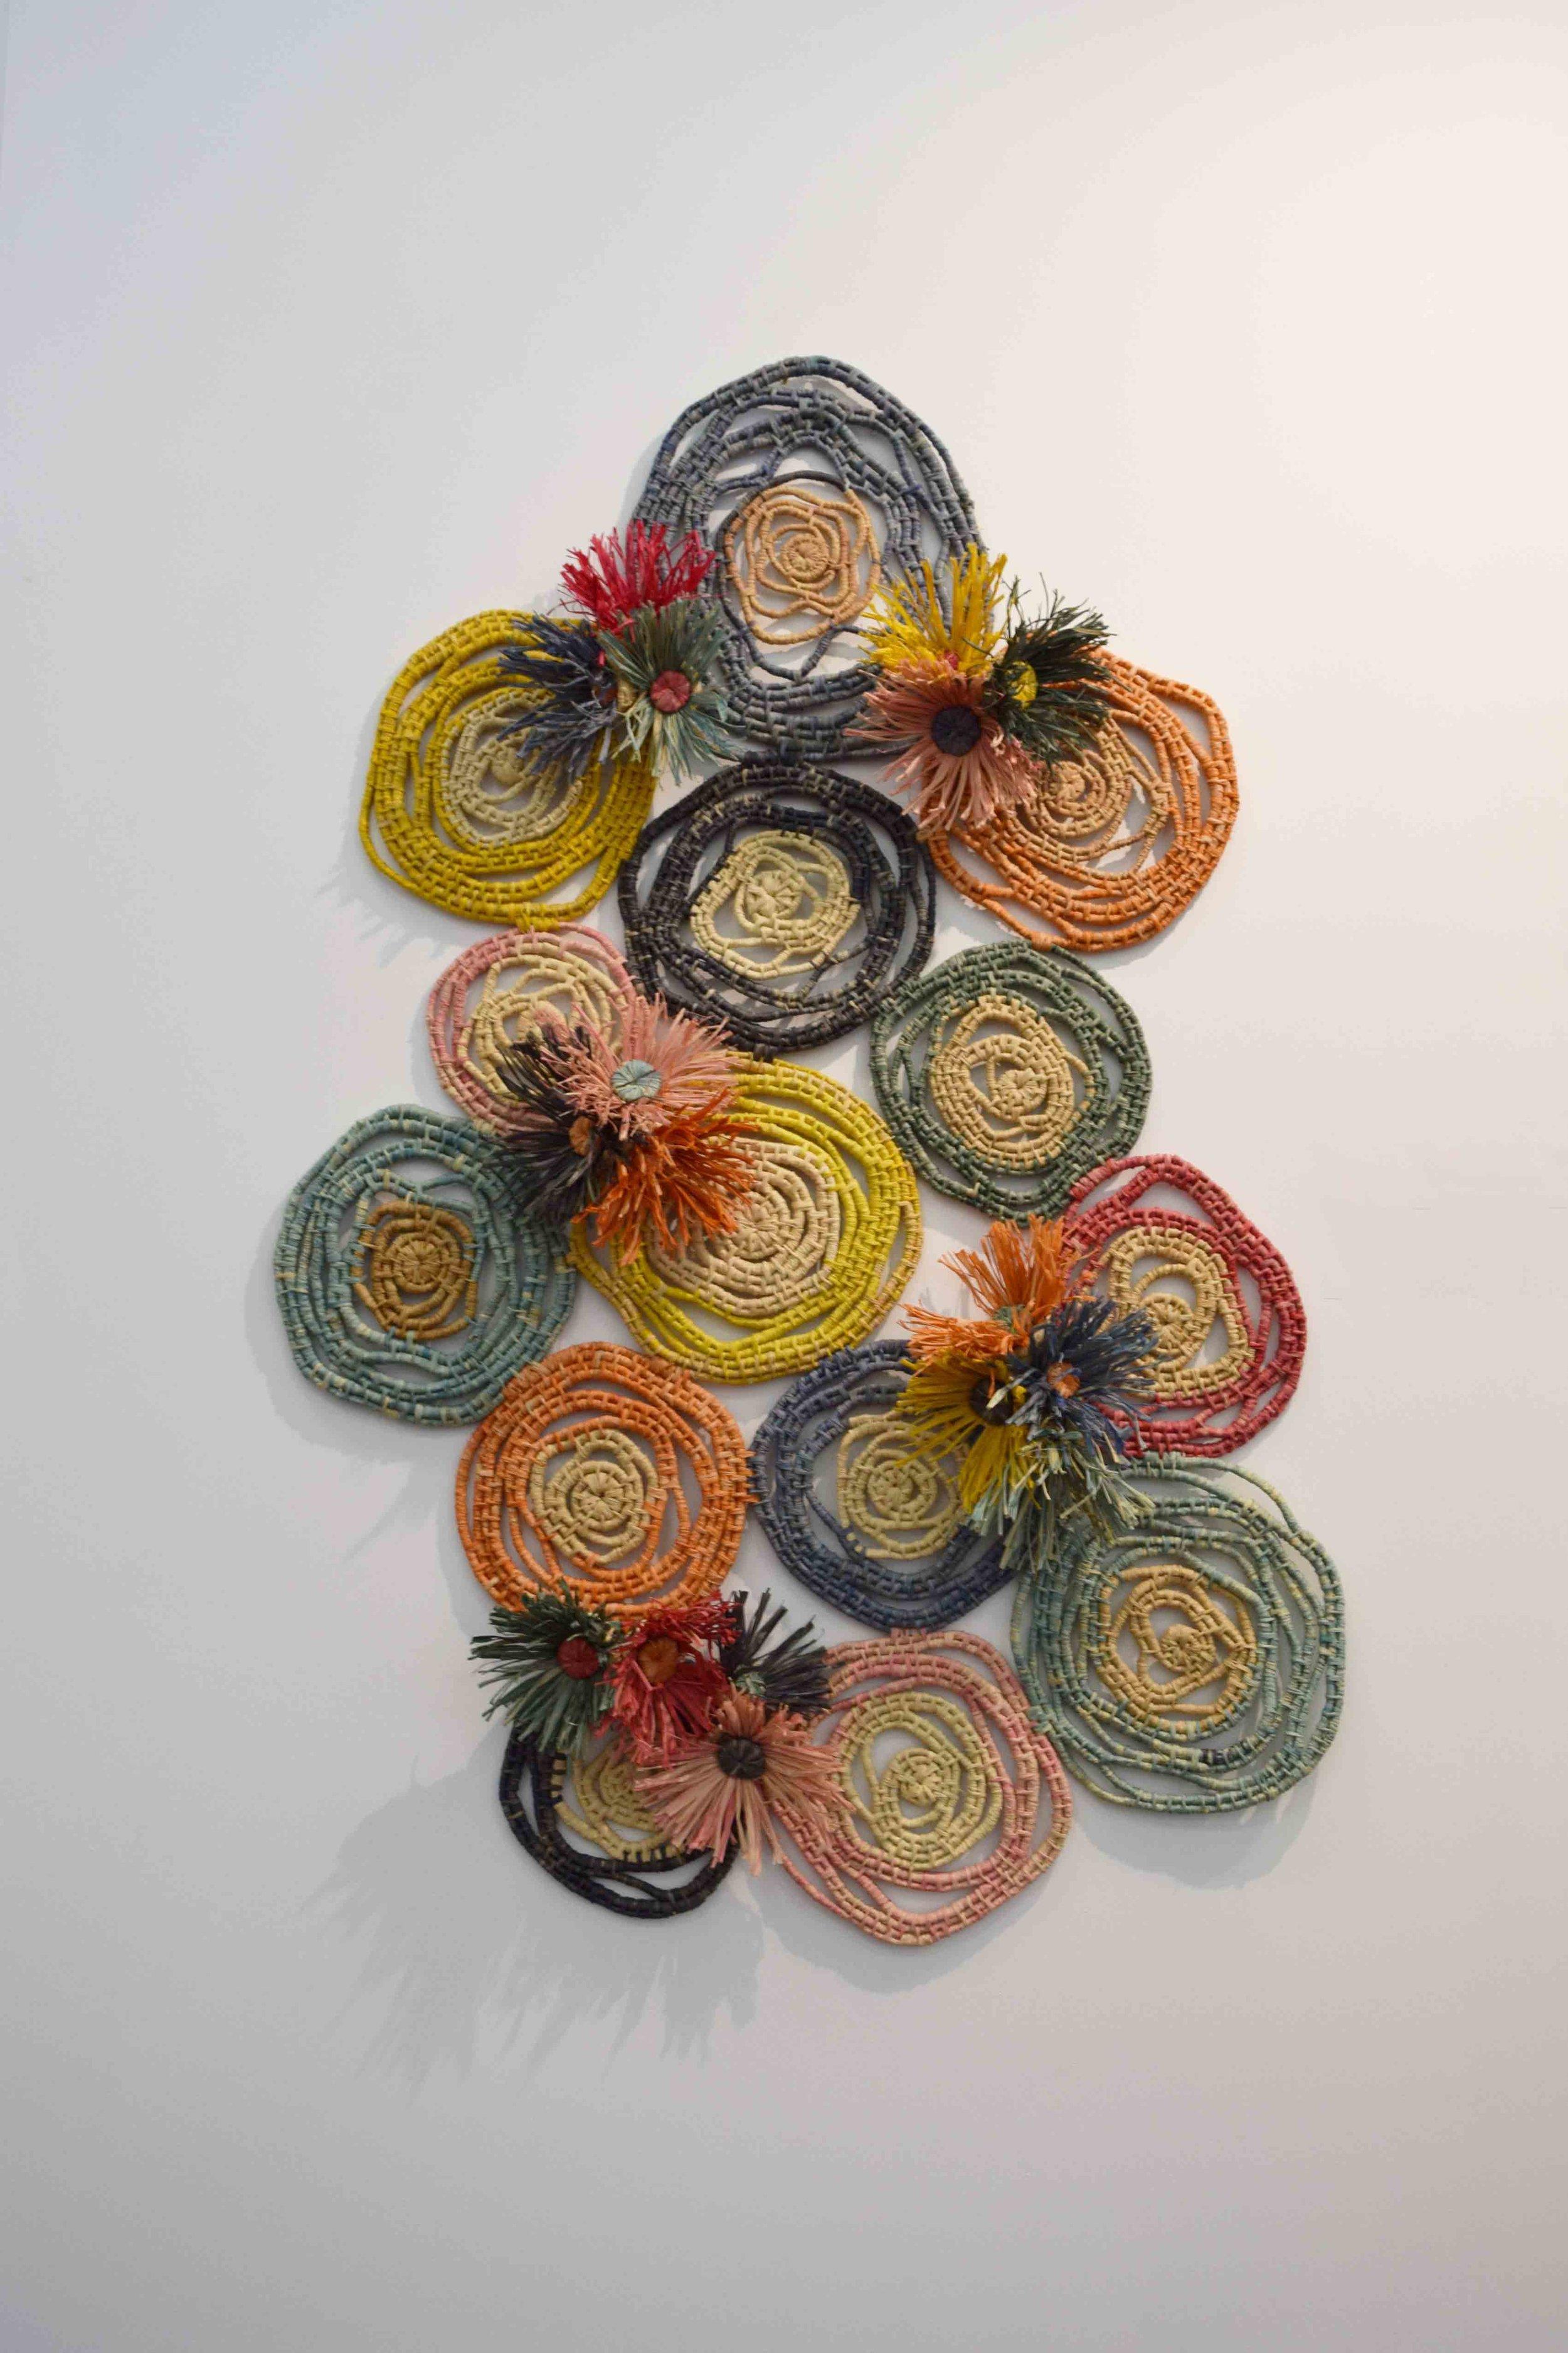 1. Lea Taylor,  Kwobadak Bibbulmun, Moort Danjoo (Beautfiul Bibbulmun Family Together) , 2019, natural, hand dyed raffia, 104 x 68 cm $1,650